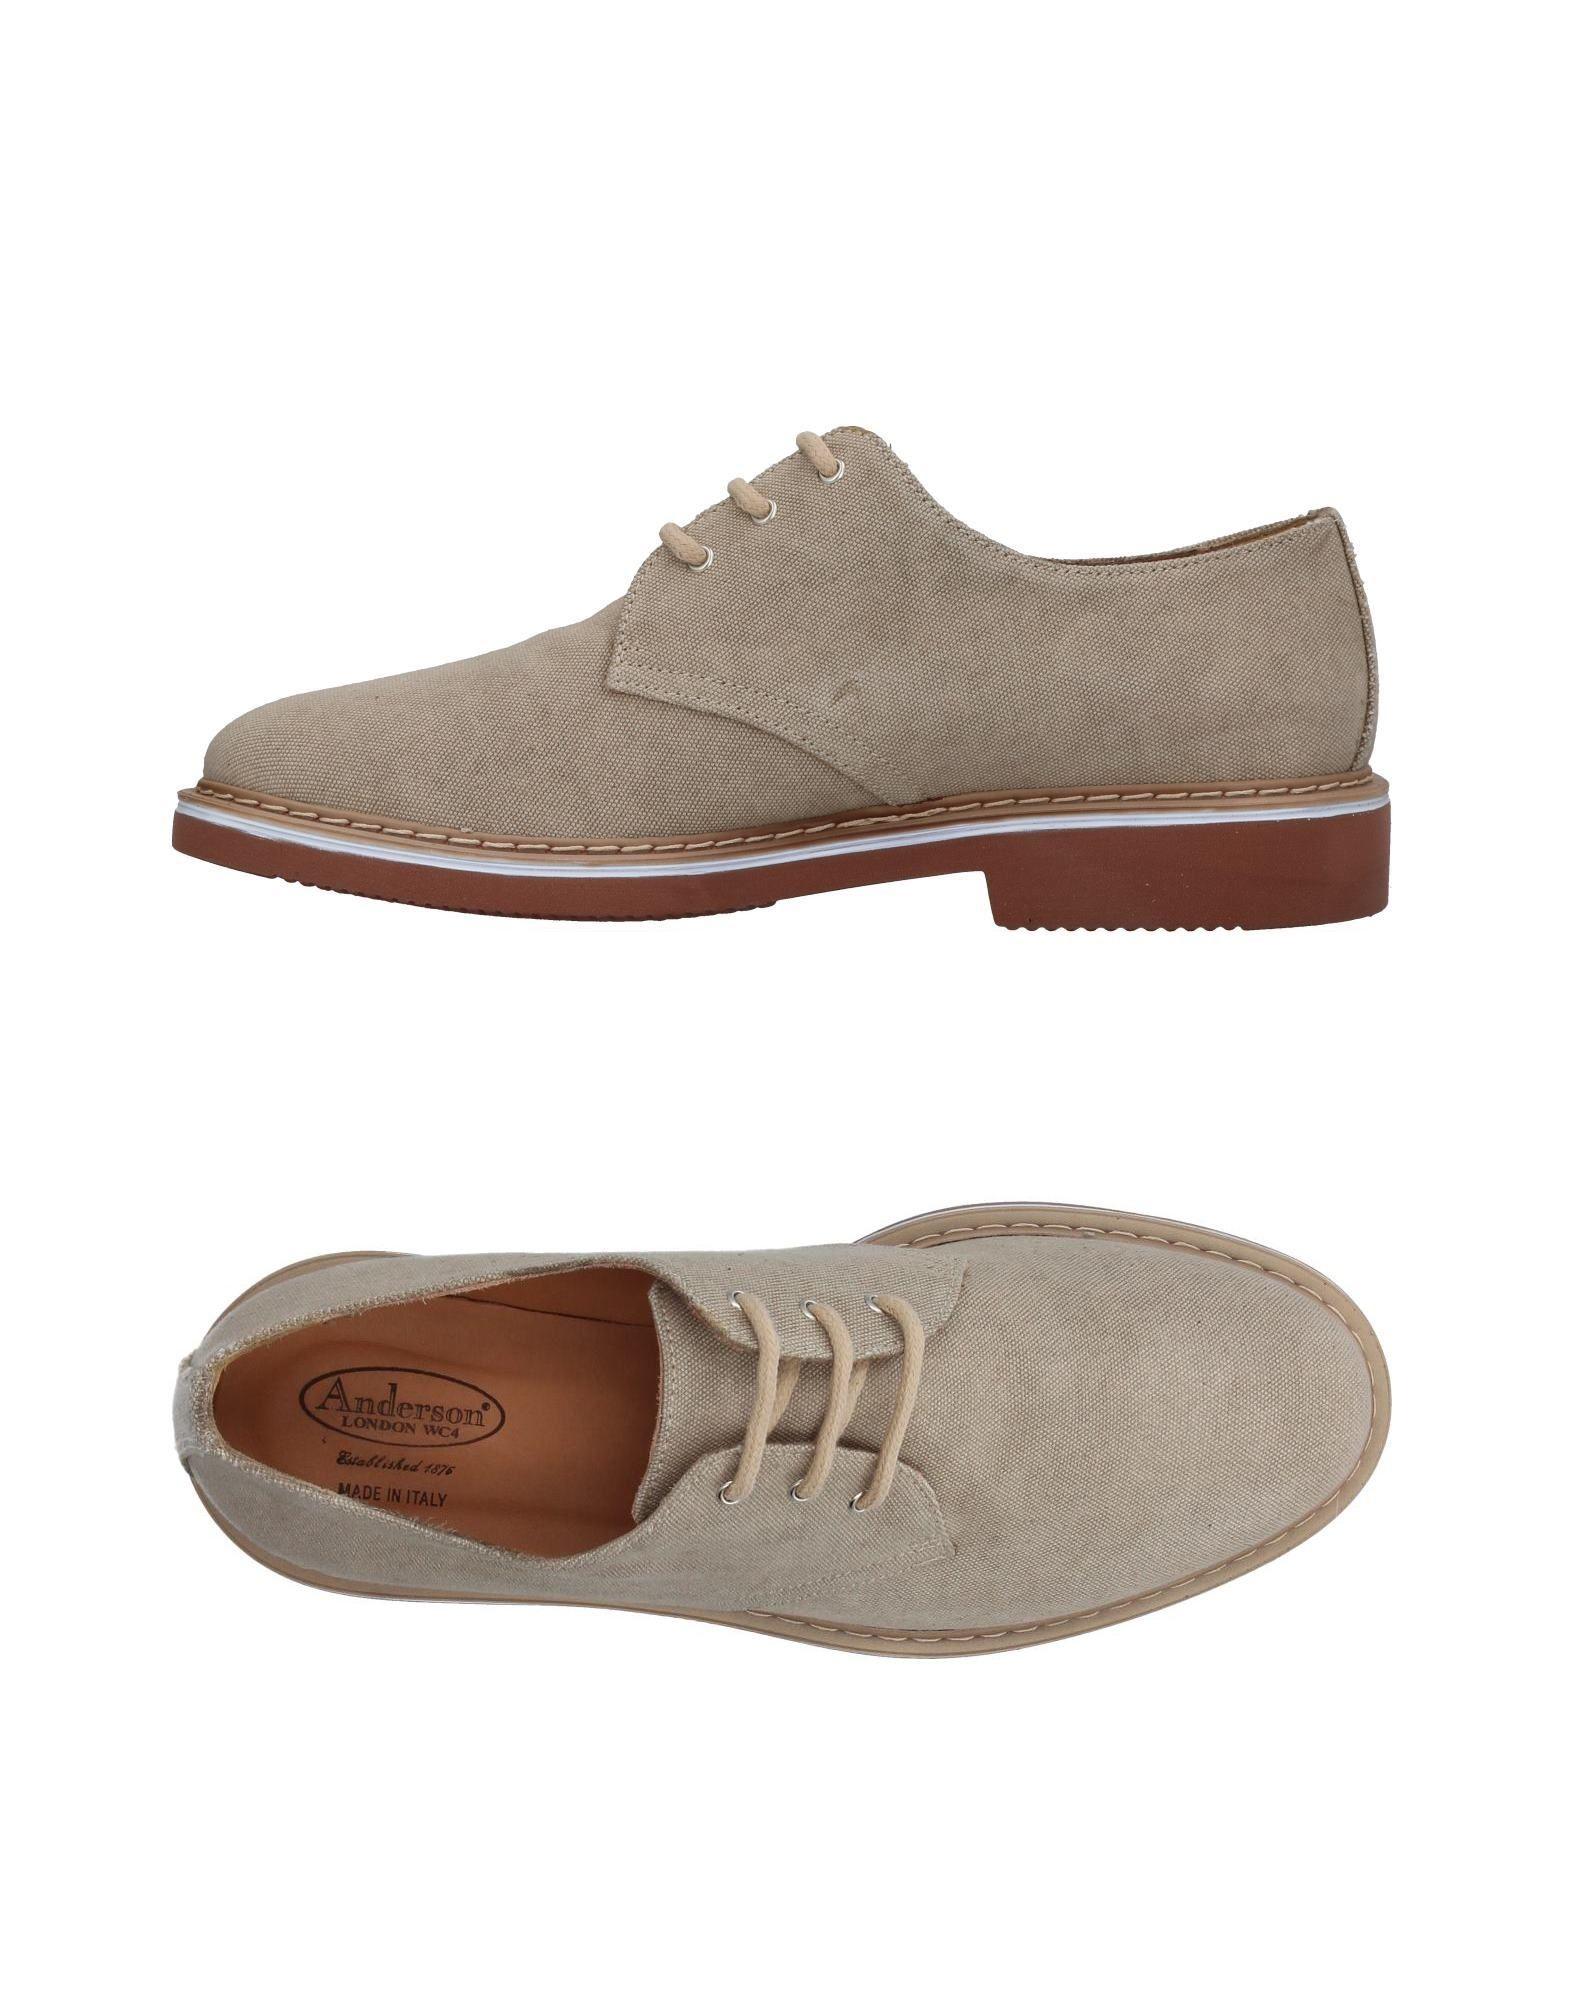 Rabatt echte Schuhe Anderson Schnürschuhe Herren  11382234FW